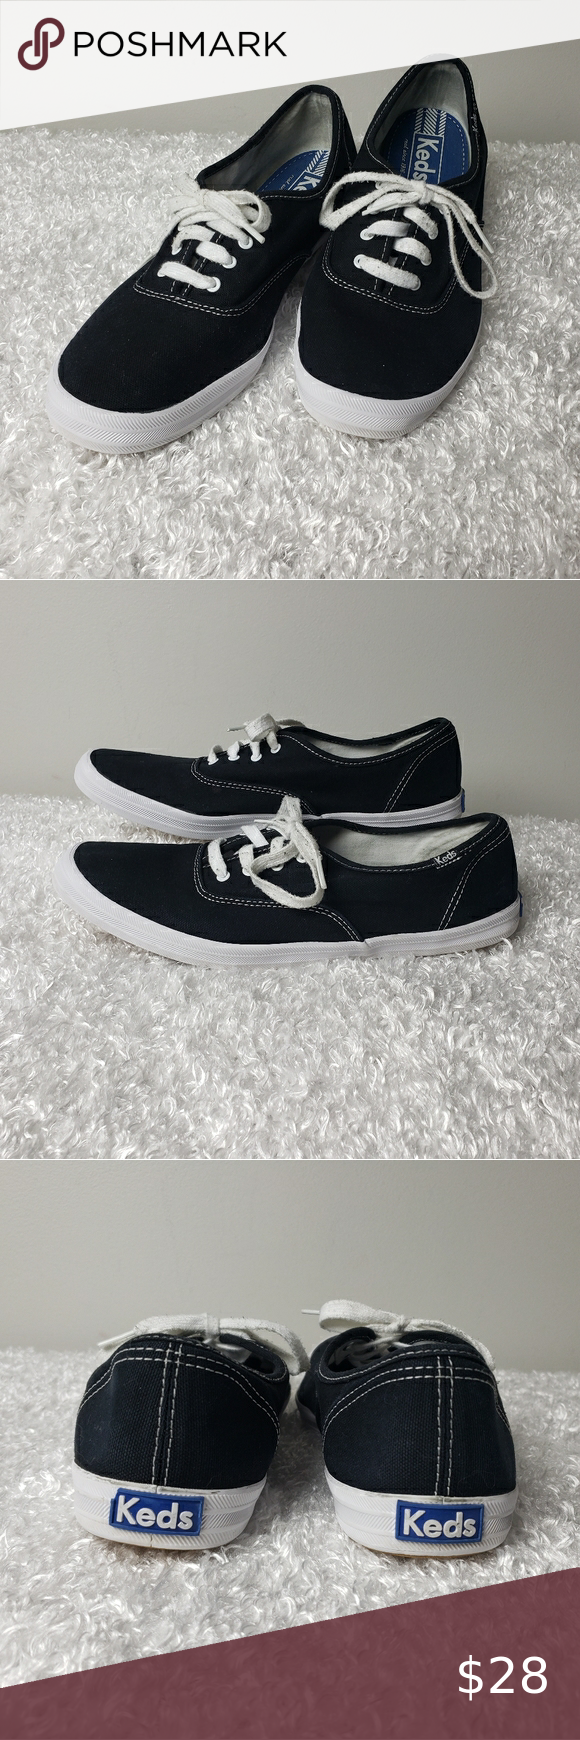 Keds, Womens shoes sneakers, Keds shoes